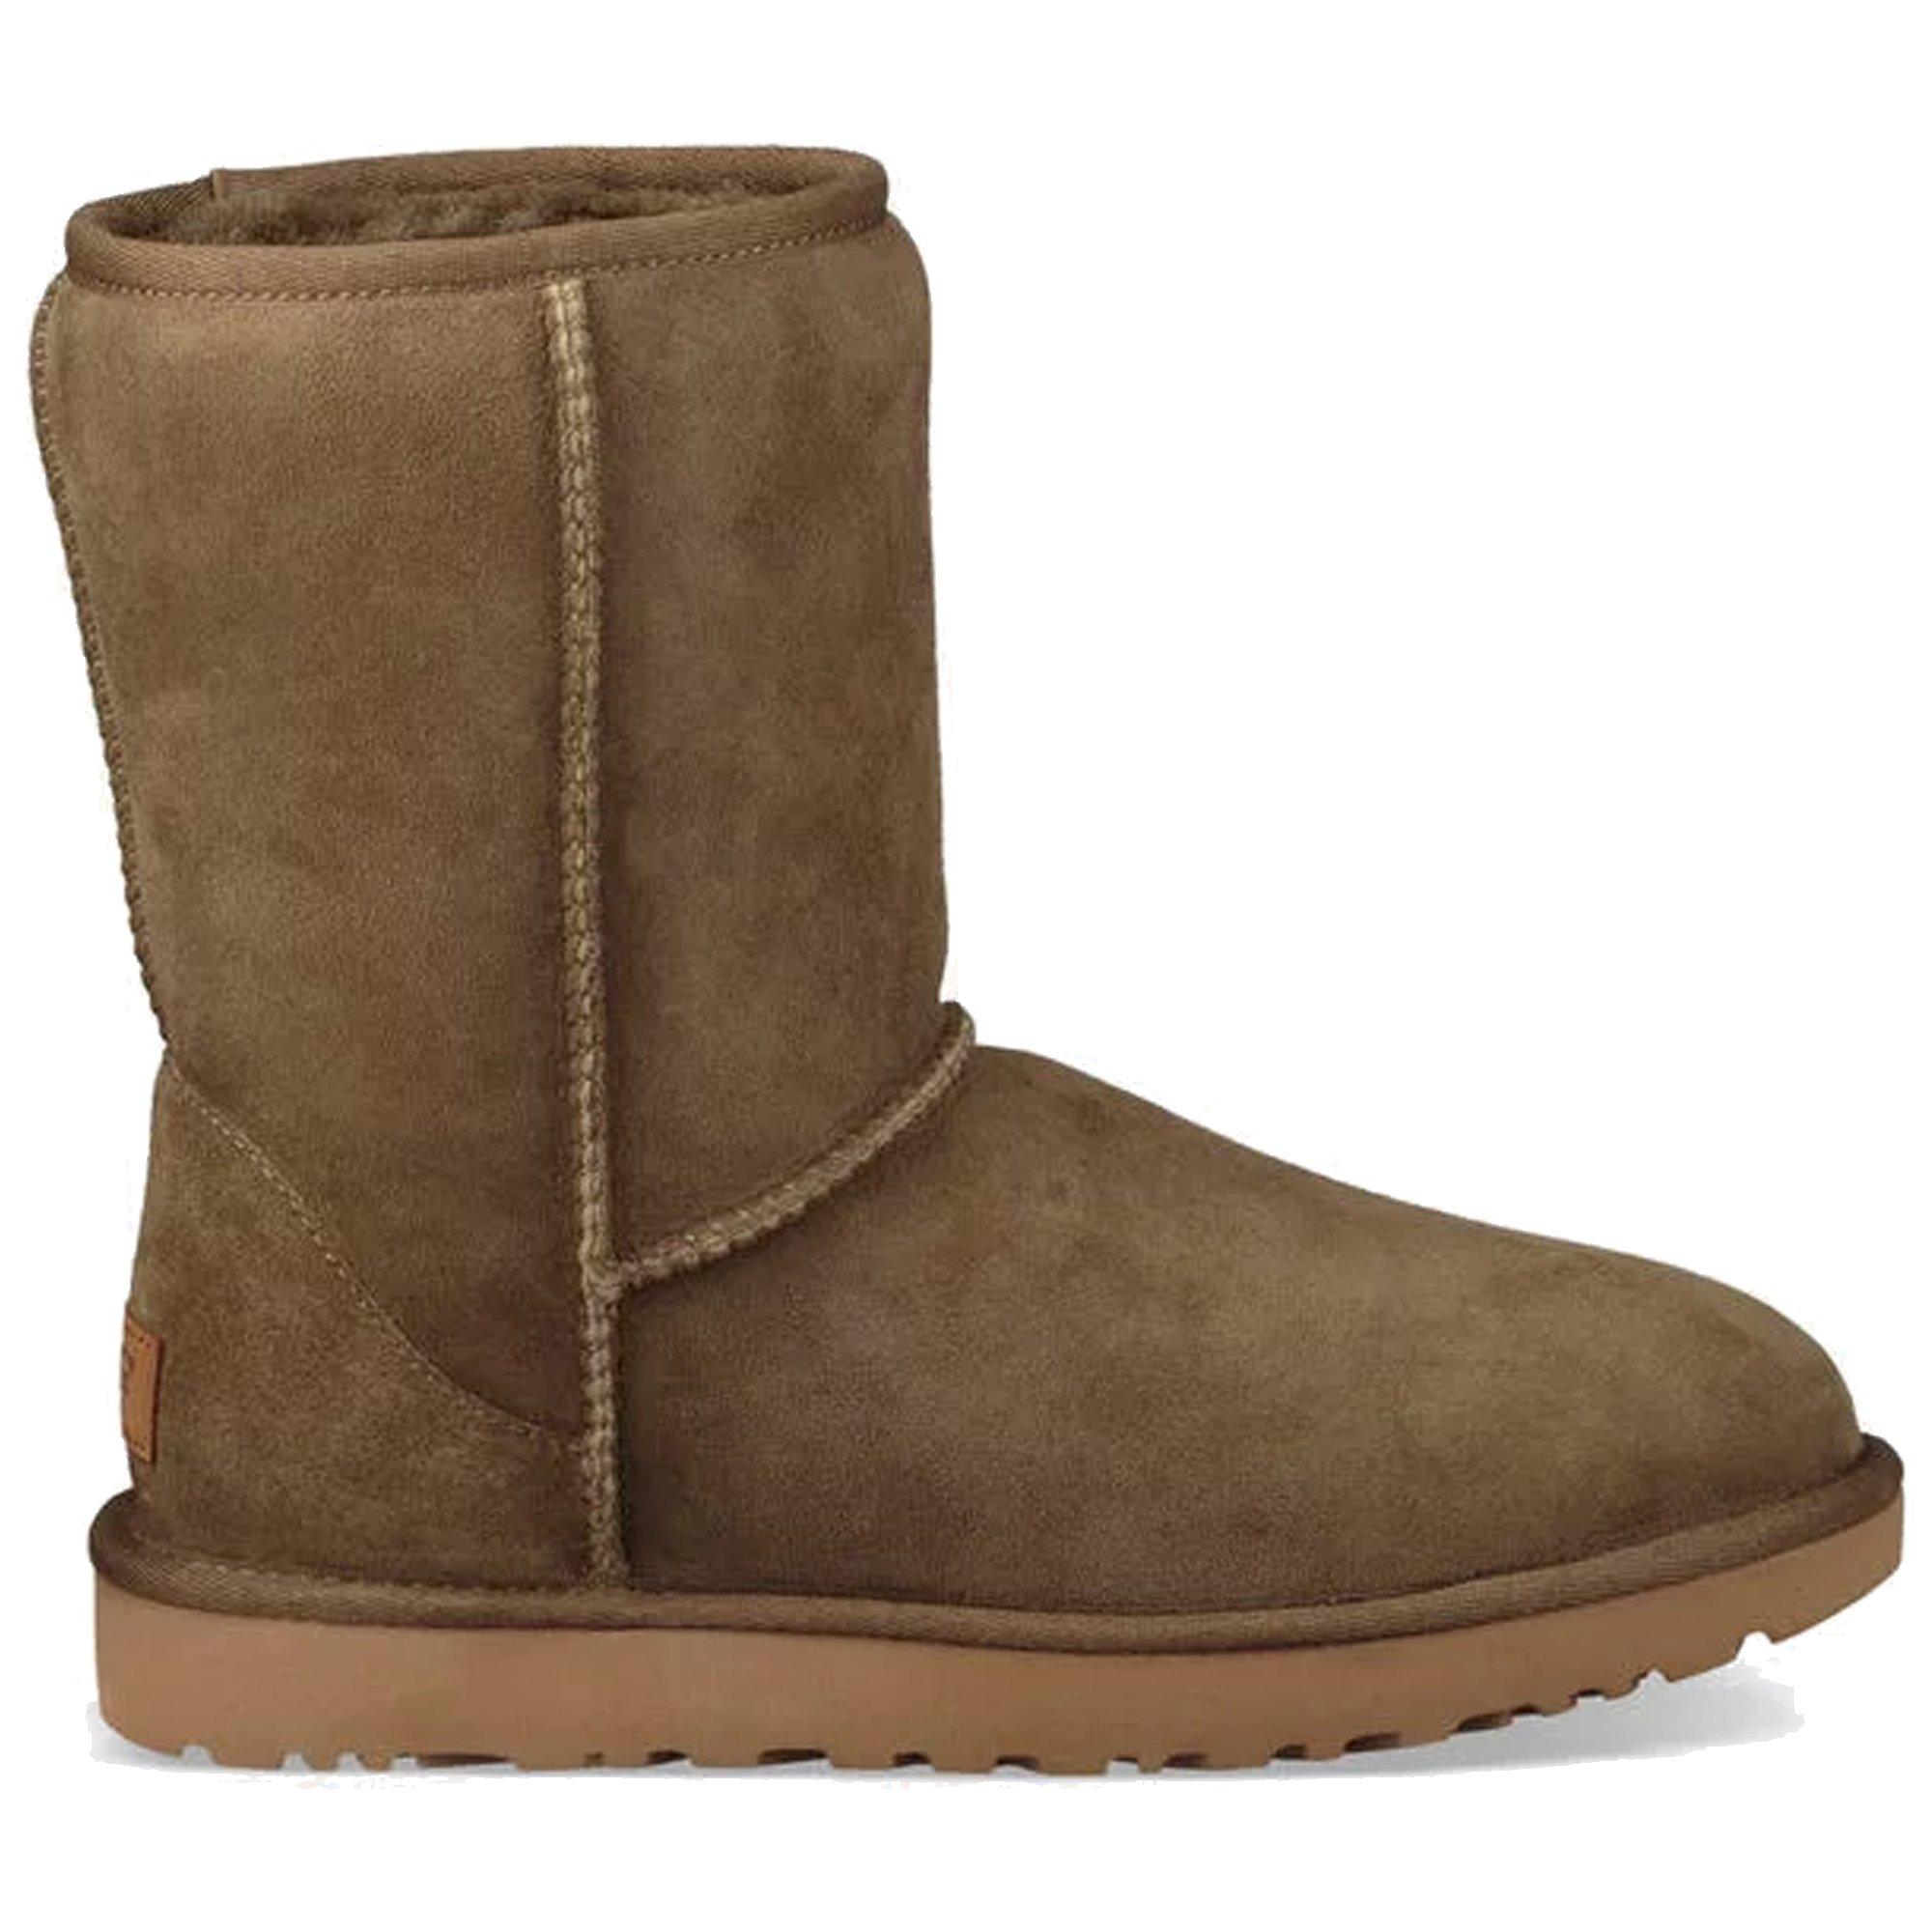 UGG Classic Short Boots II, 6M, Spruce